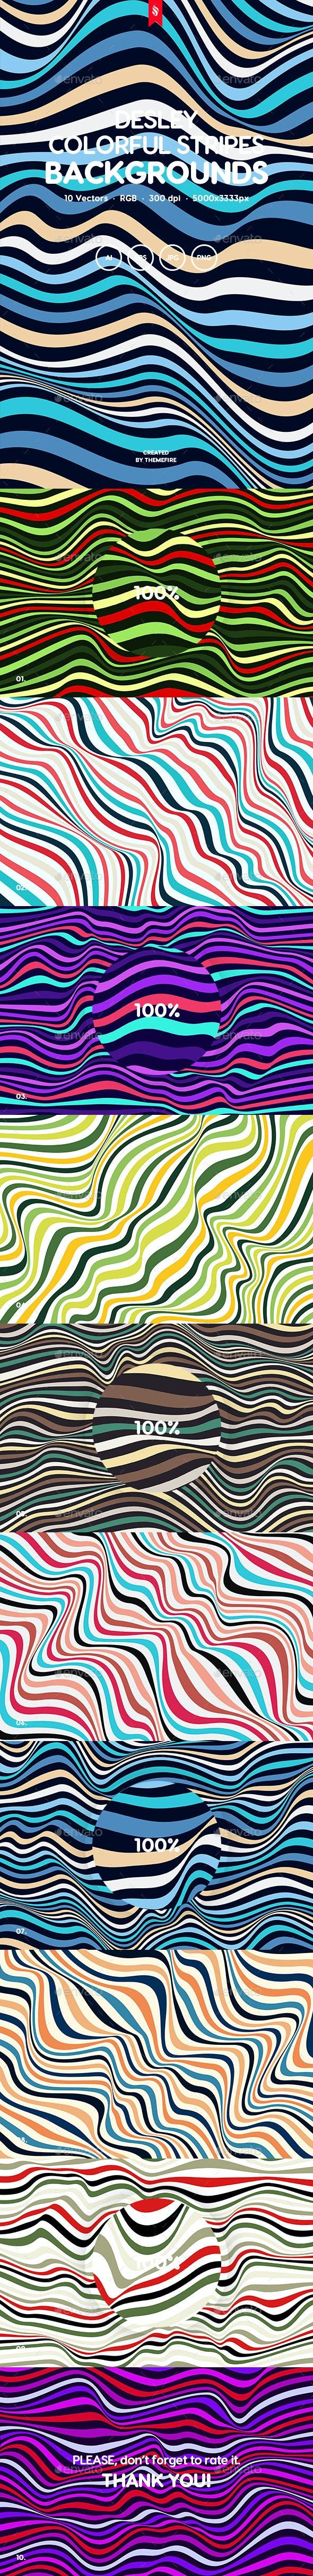 Desley - Colorful Striped Waves Vector Background Set - Backgrounds Graphics